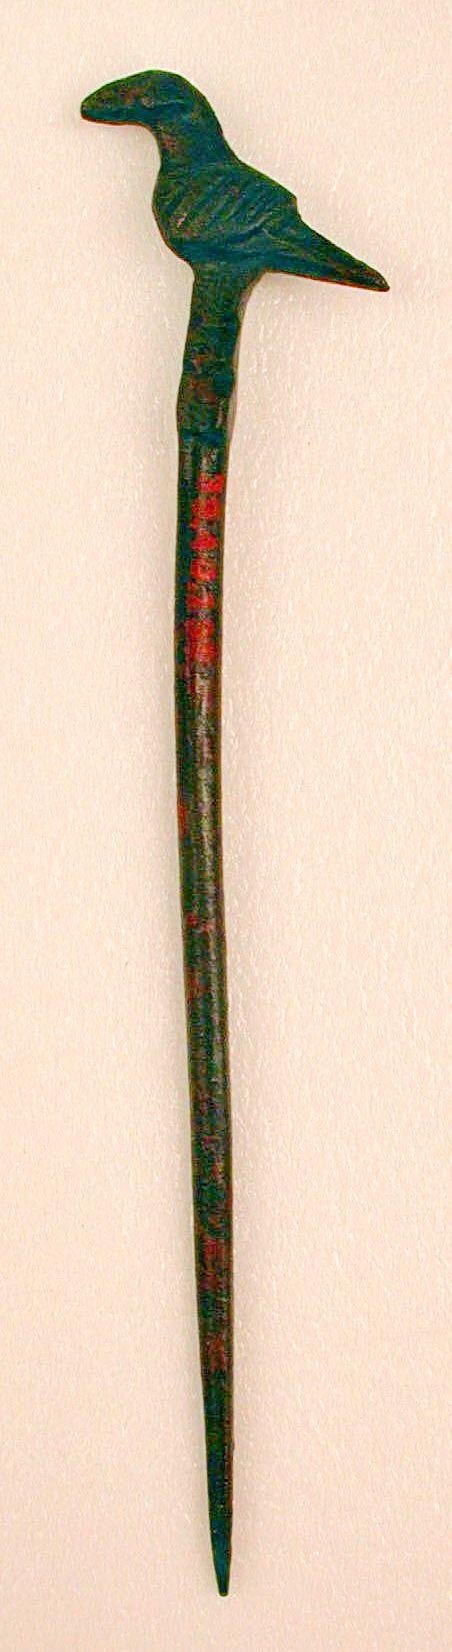 Pin Date: 9th–10th century Iran, Nishapur (9.7 cm) - The Metropolitan Museum of Art.